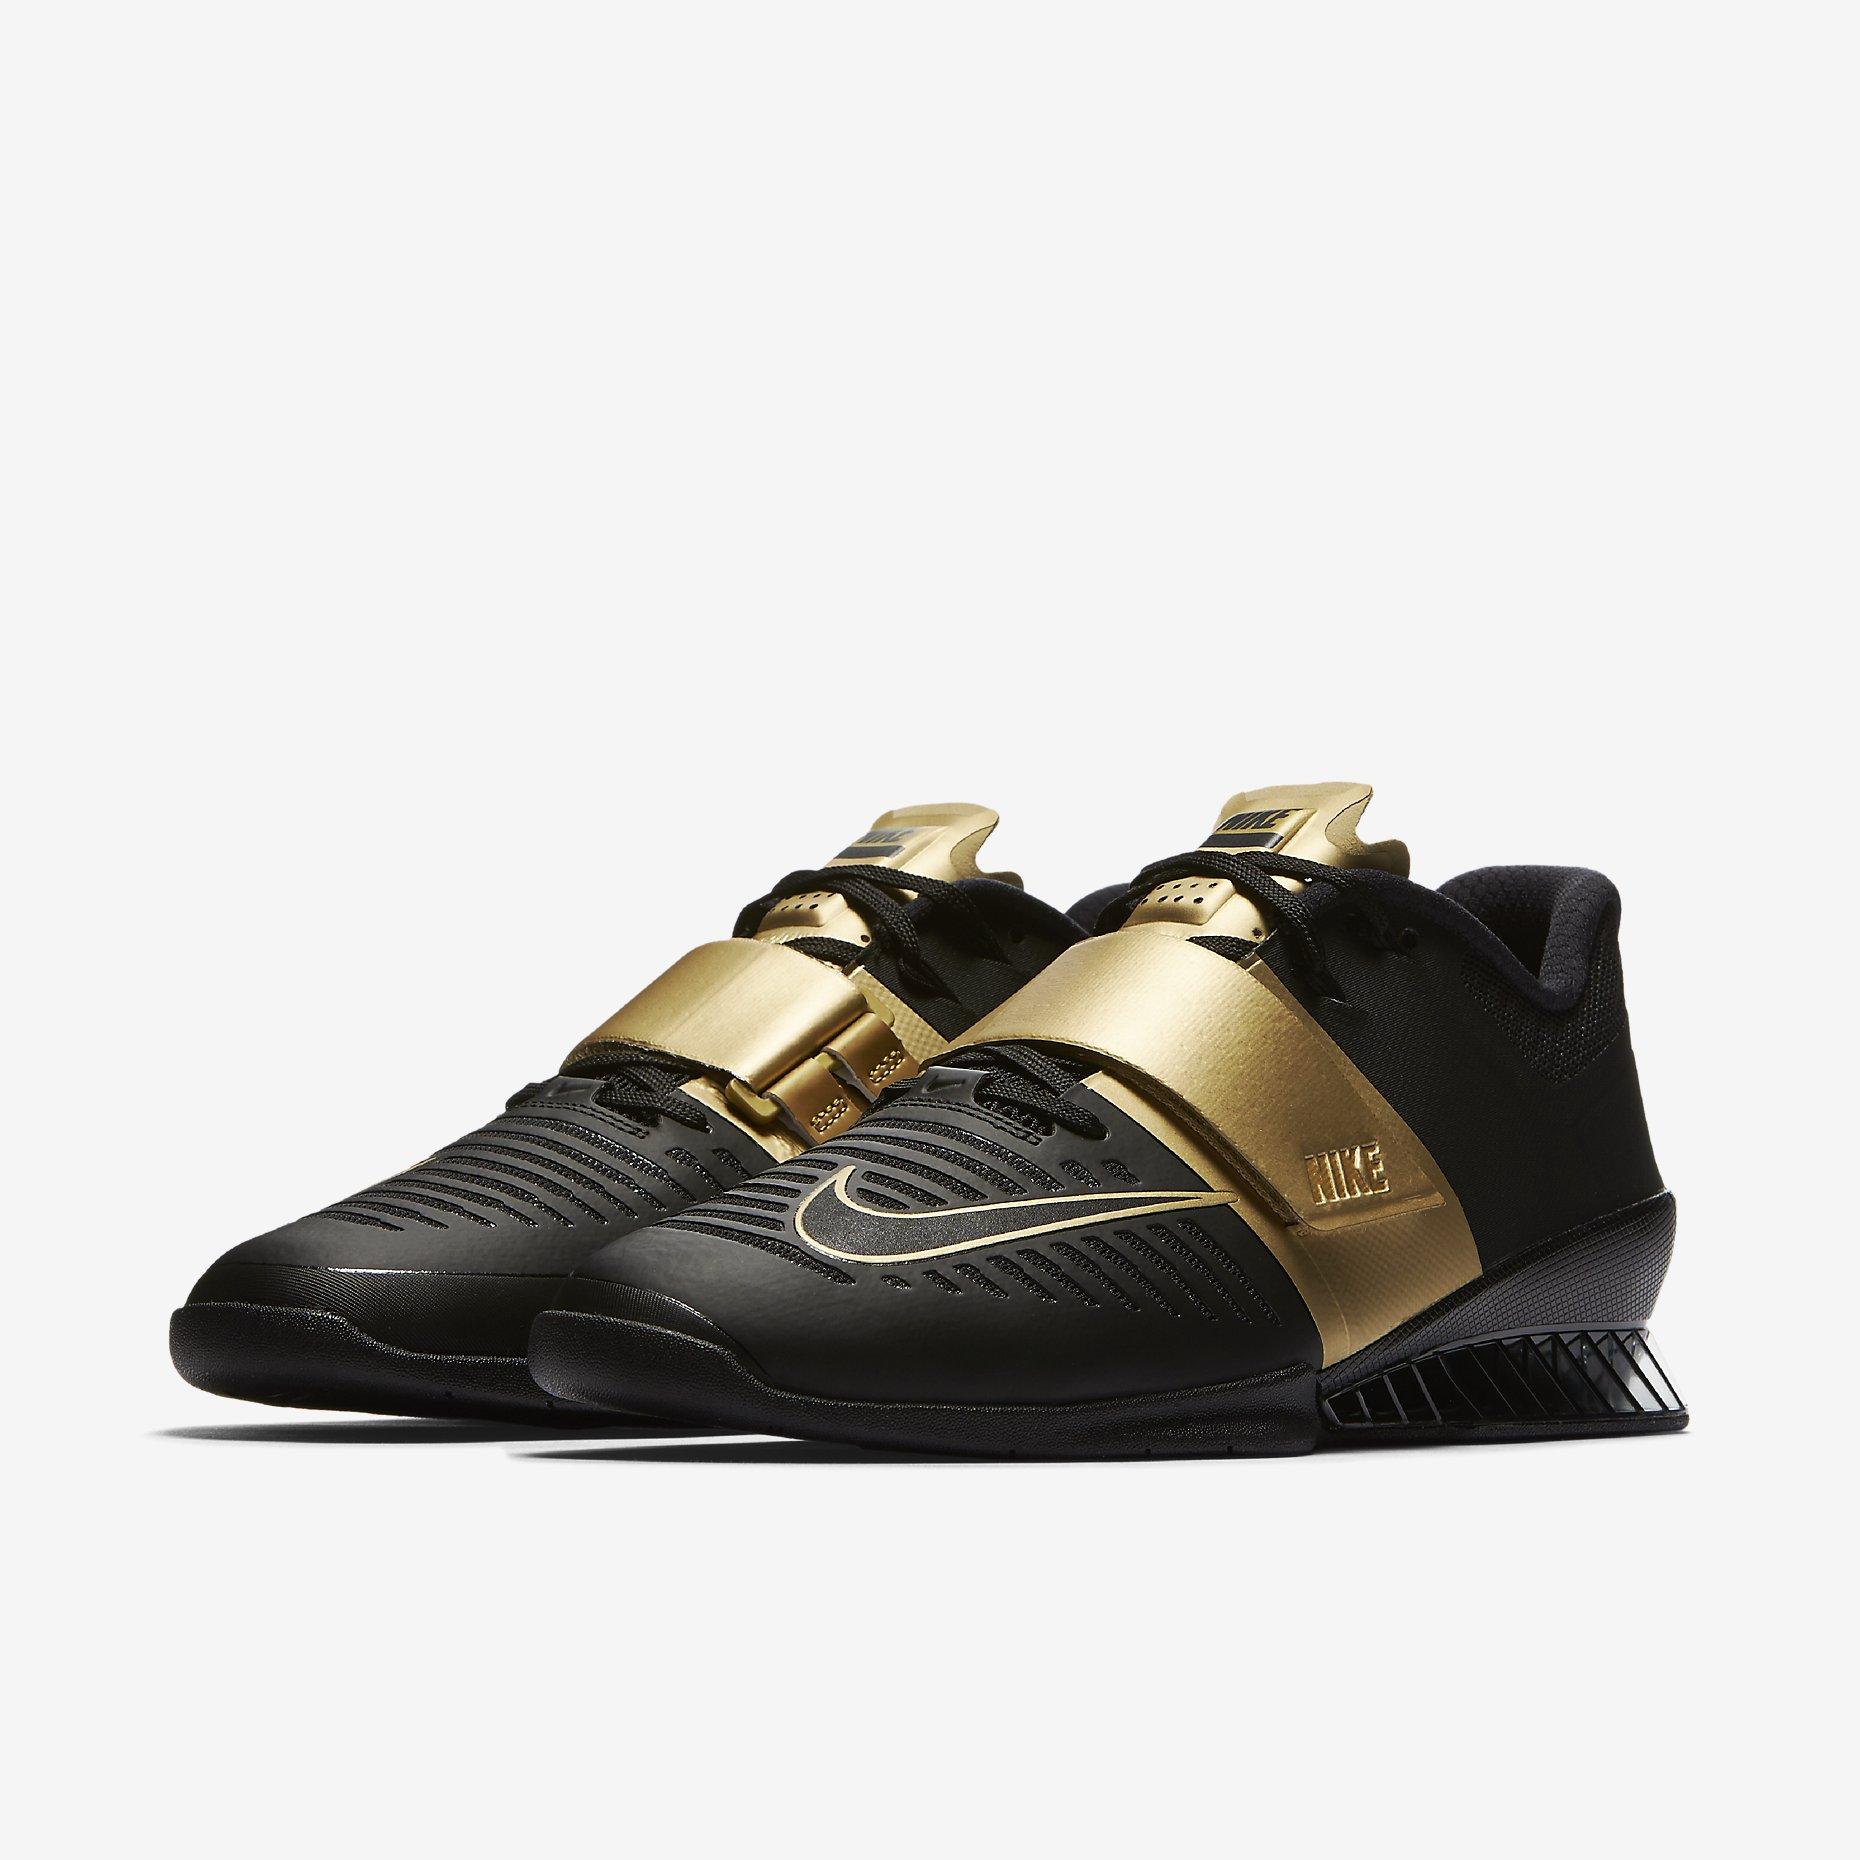 romaleos-3-x-mens-training-shoe (4)